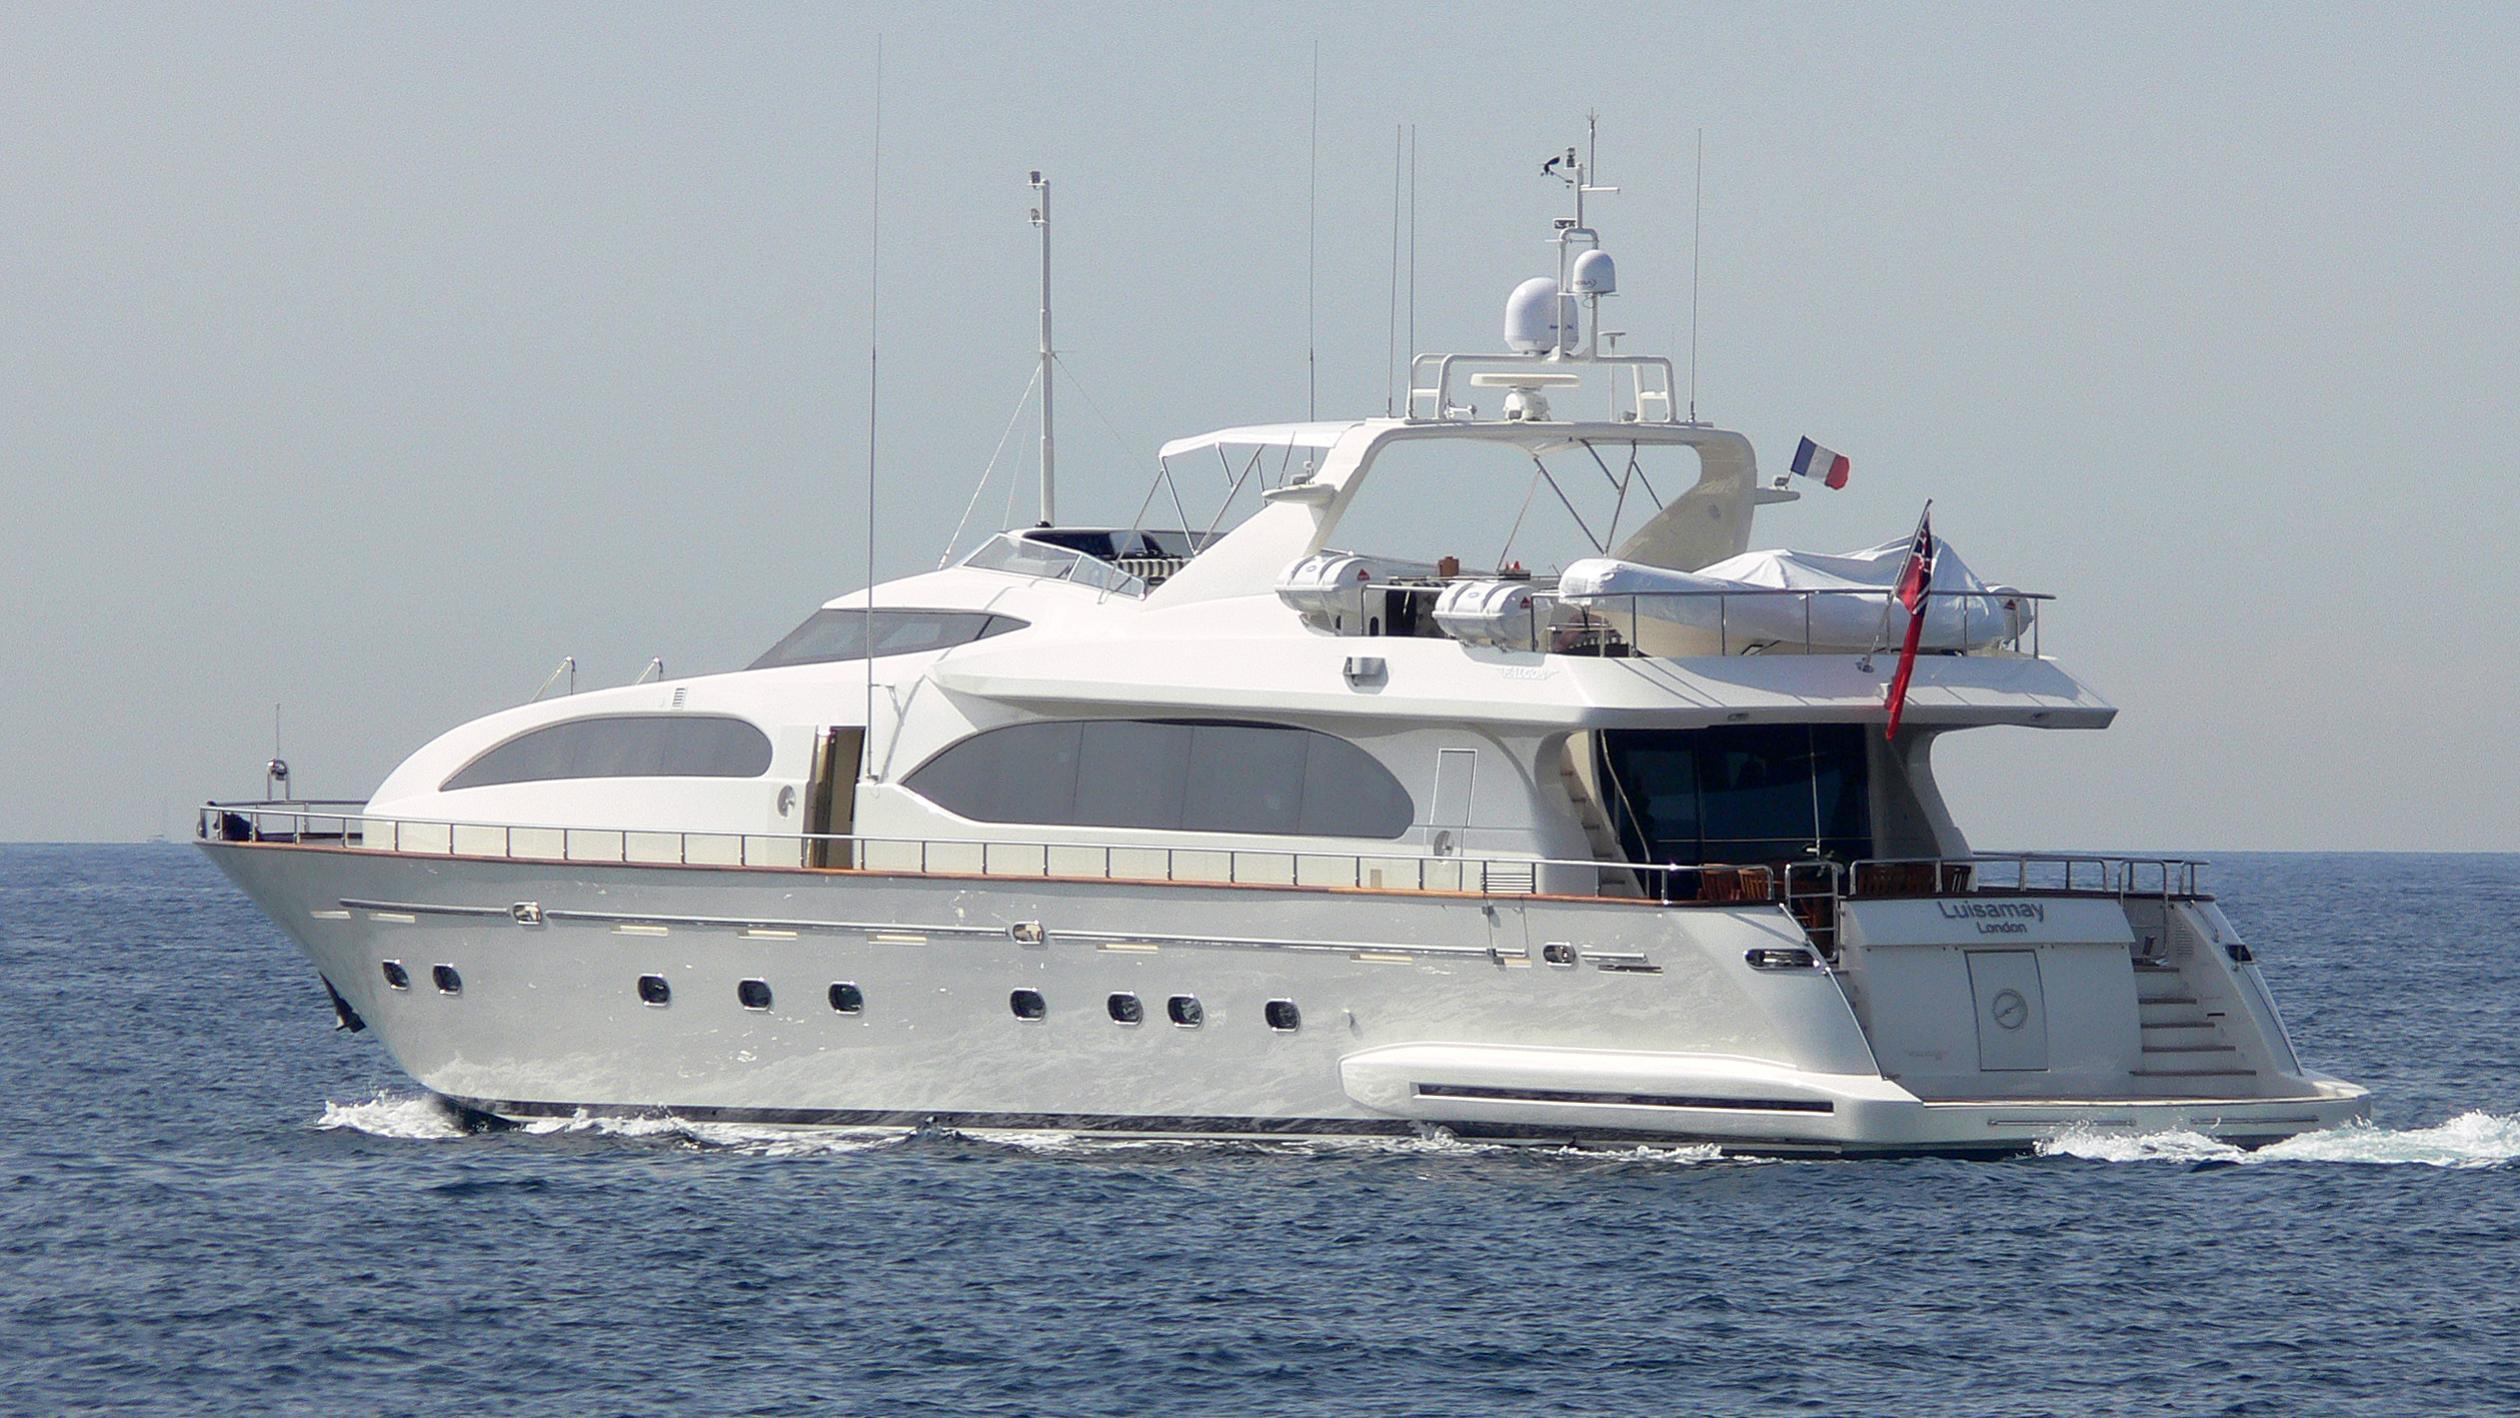 luisamay-iii-yacht-exterior